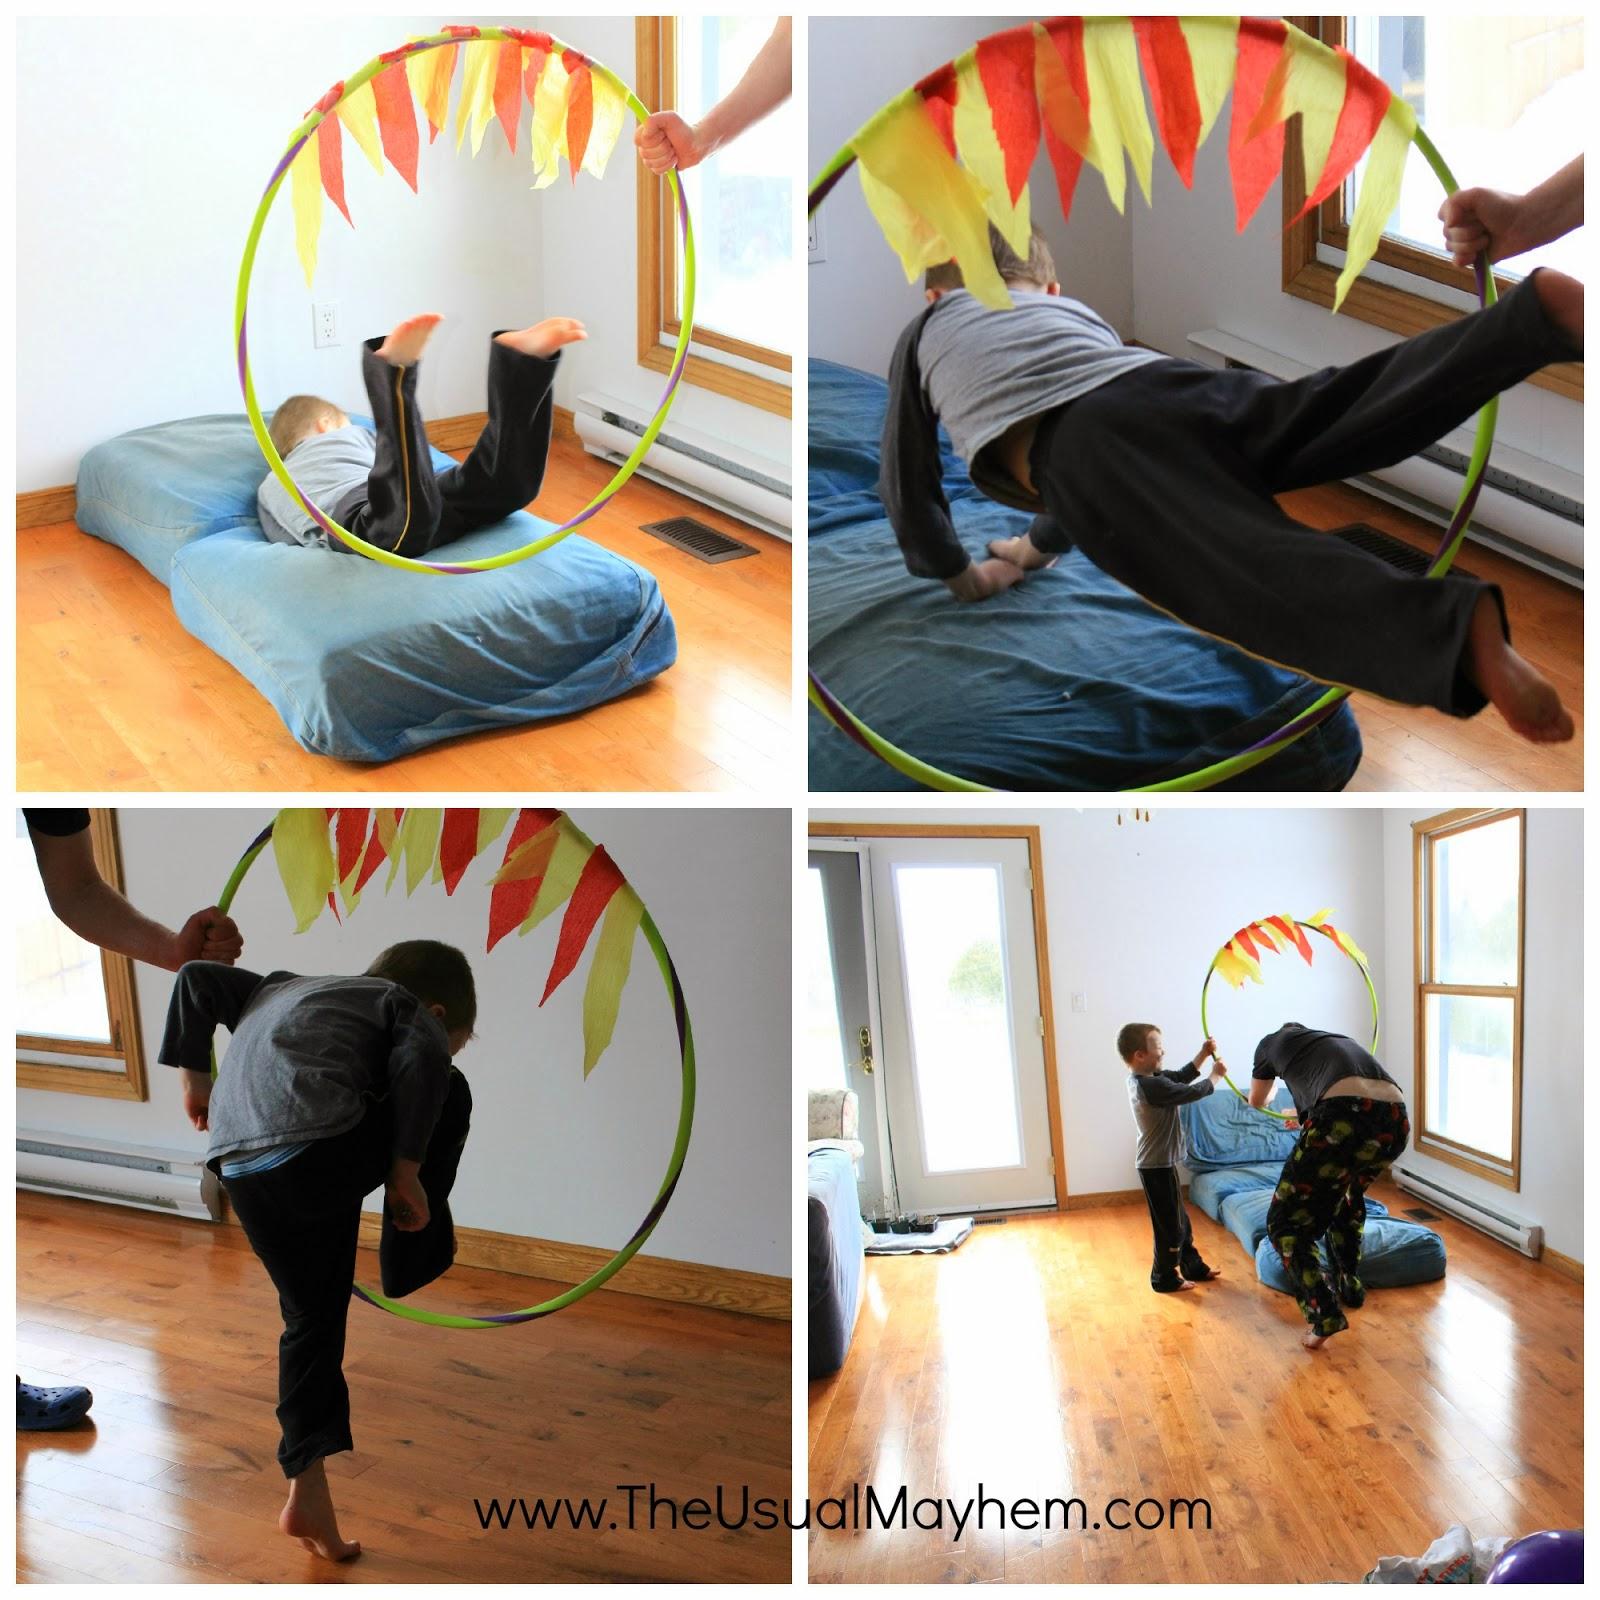 Circus Activities For Kids Part 2